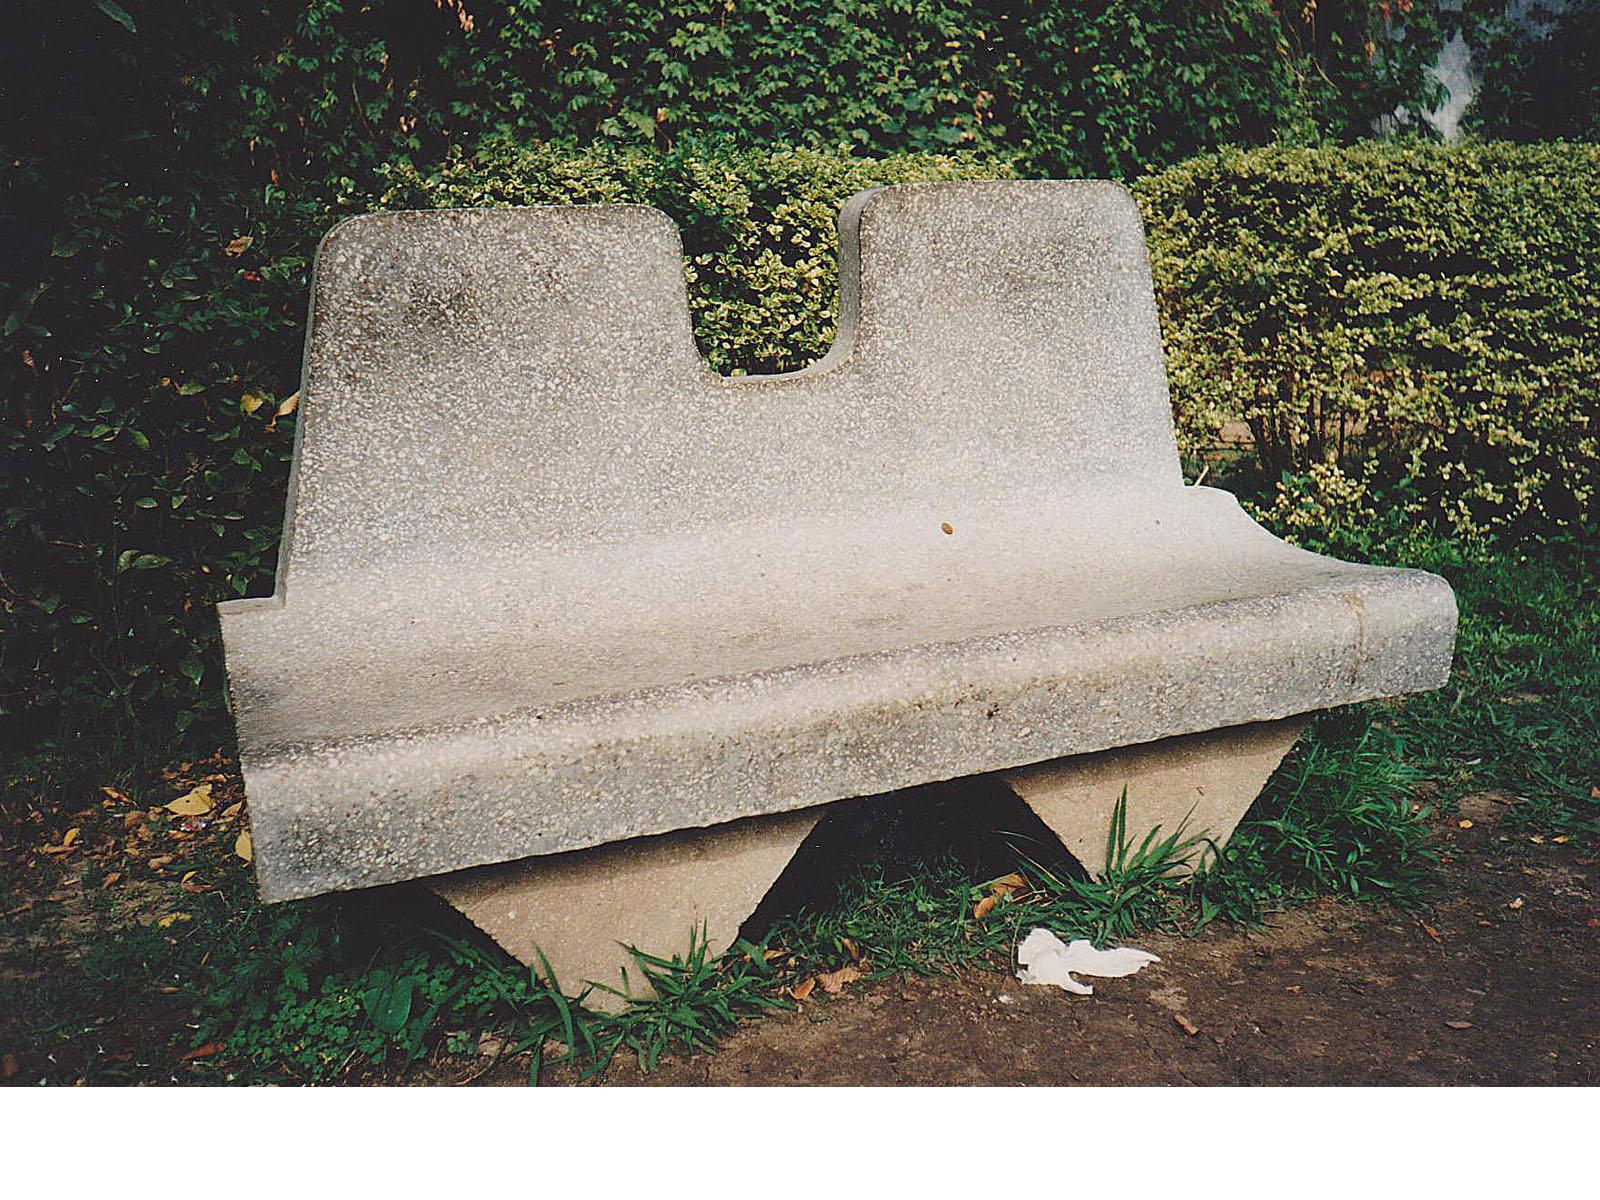 Cat-1-026-tuinenpark.jpg